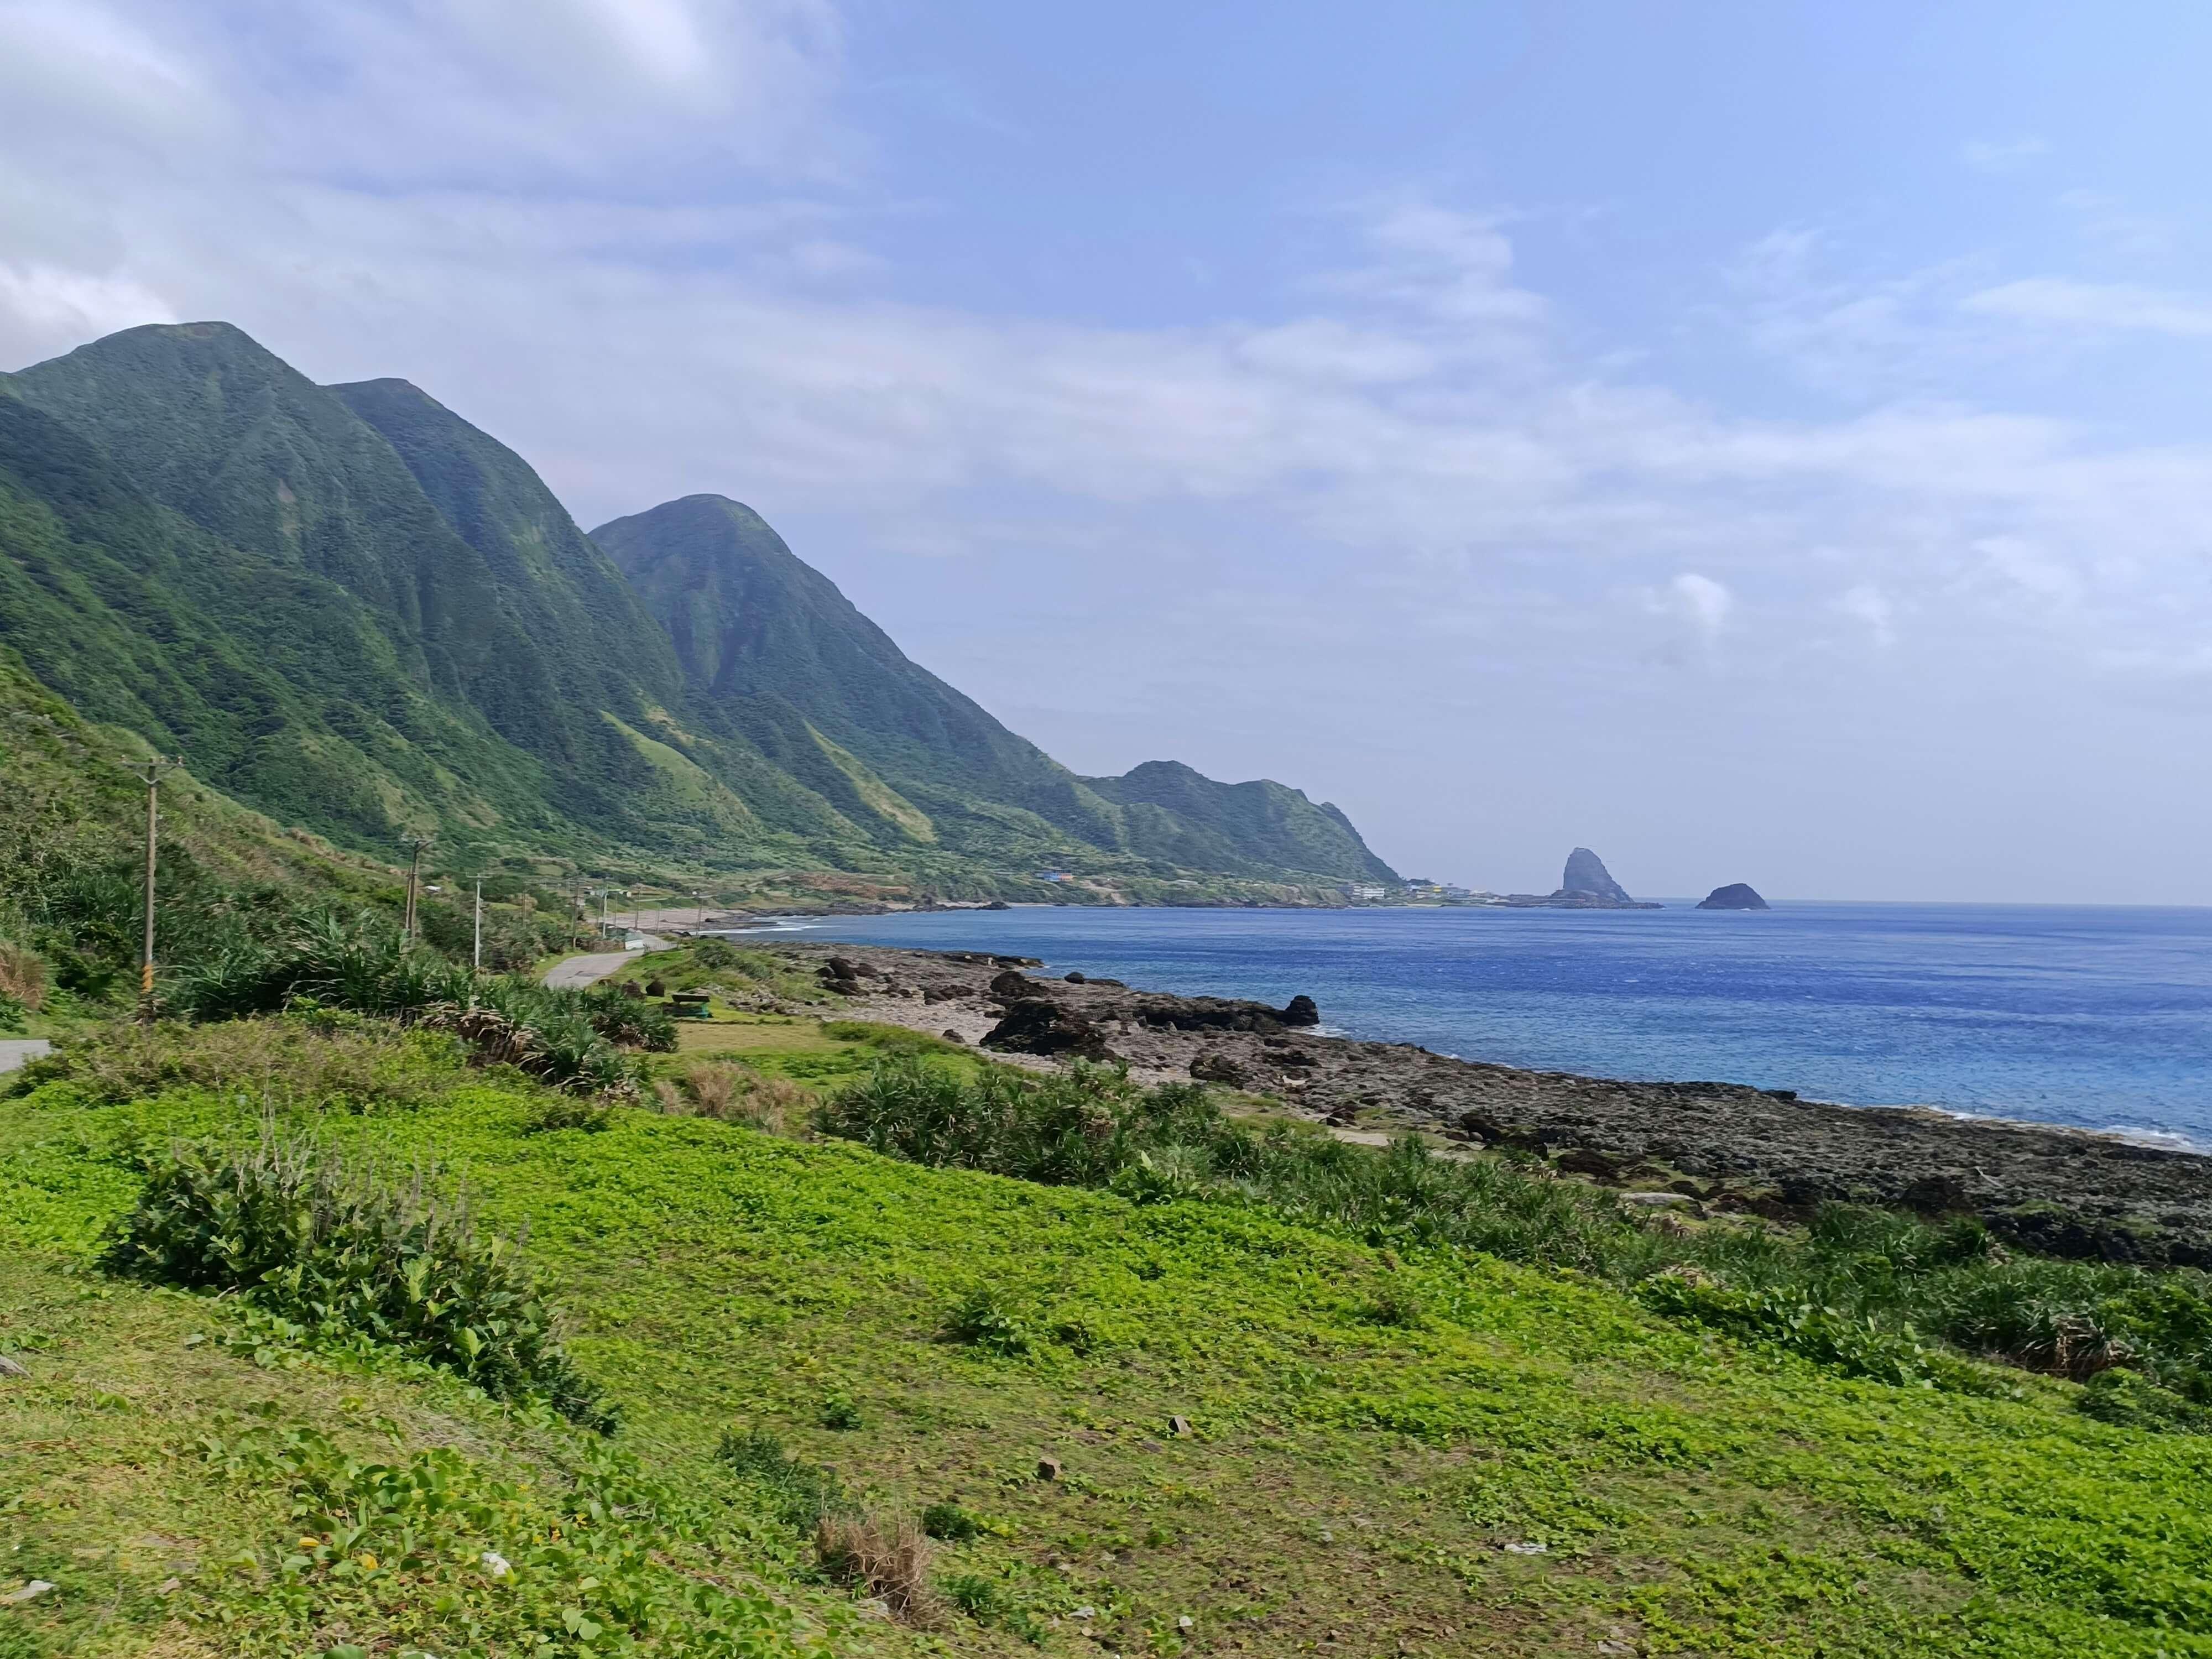 台灣|藍嶼|Orchid Island|小島漫步